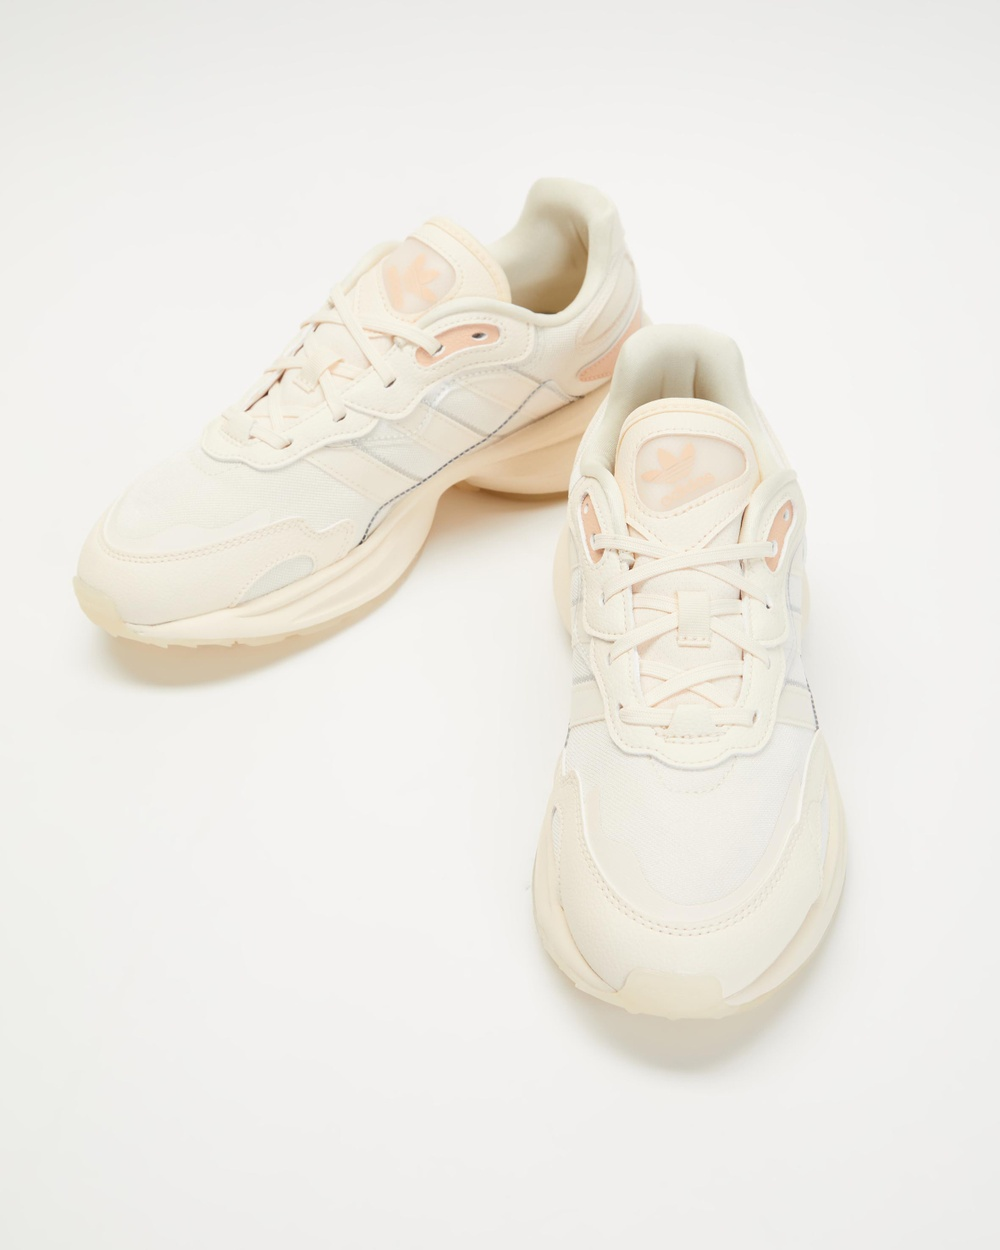 adidas Originals Zentic Women's Lifestyle Sneakers Wonder White & Halo Blush